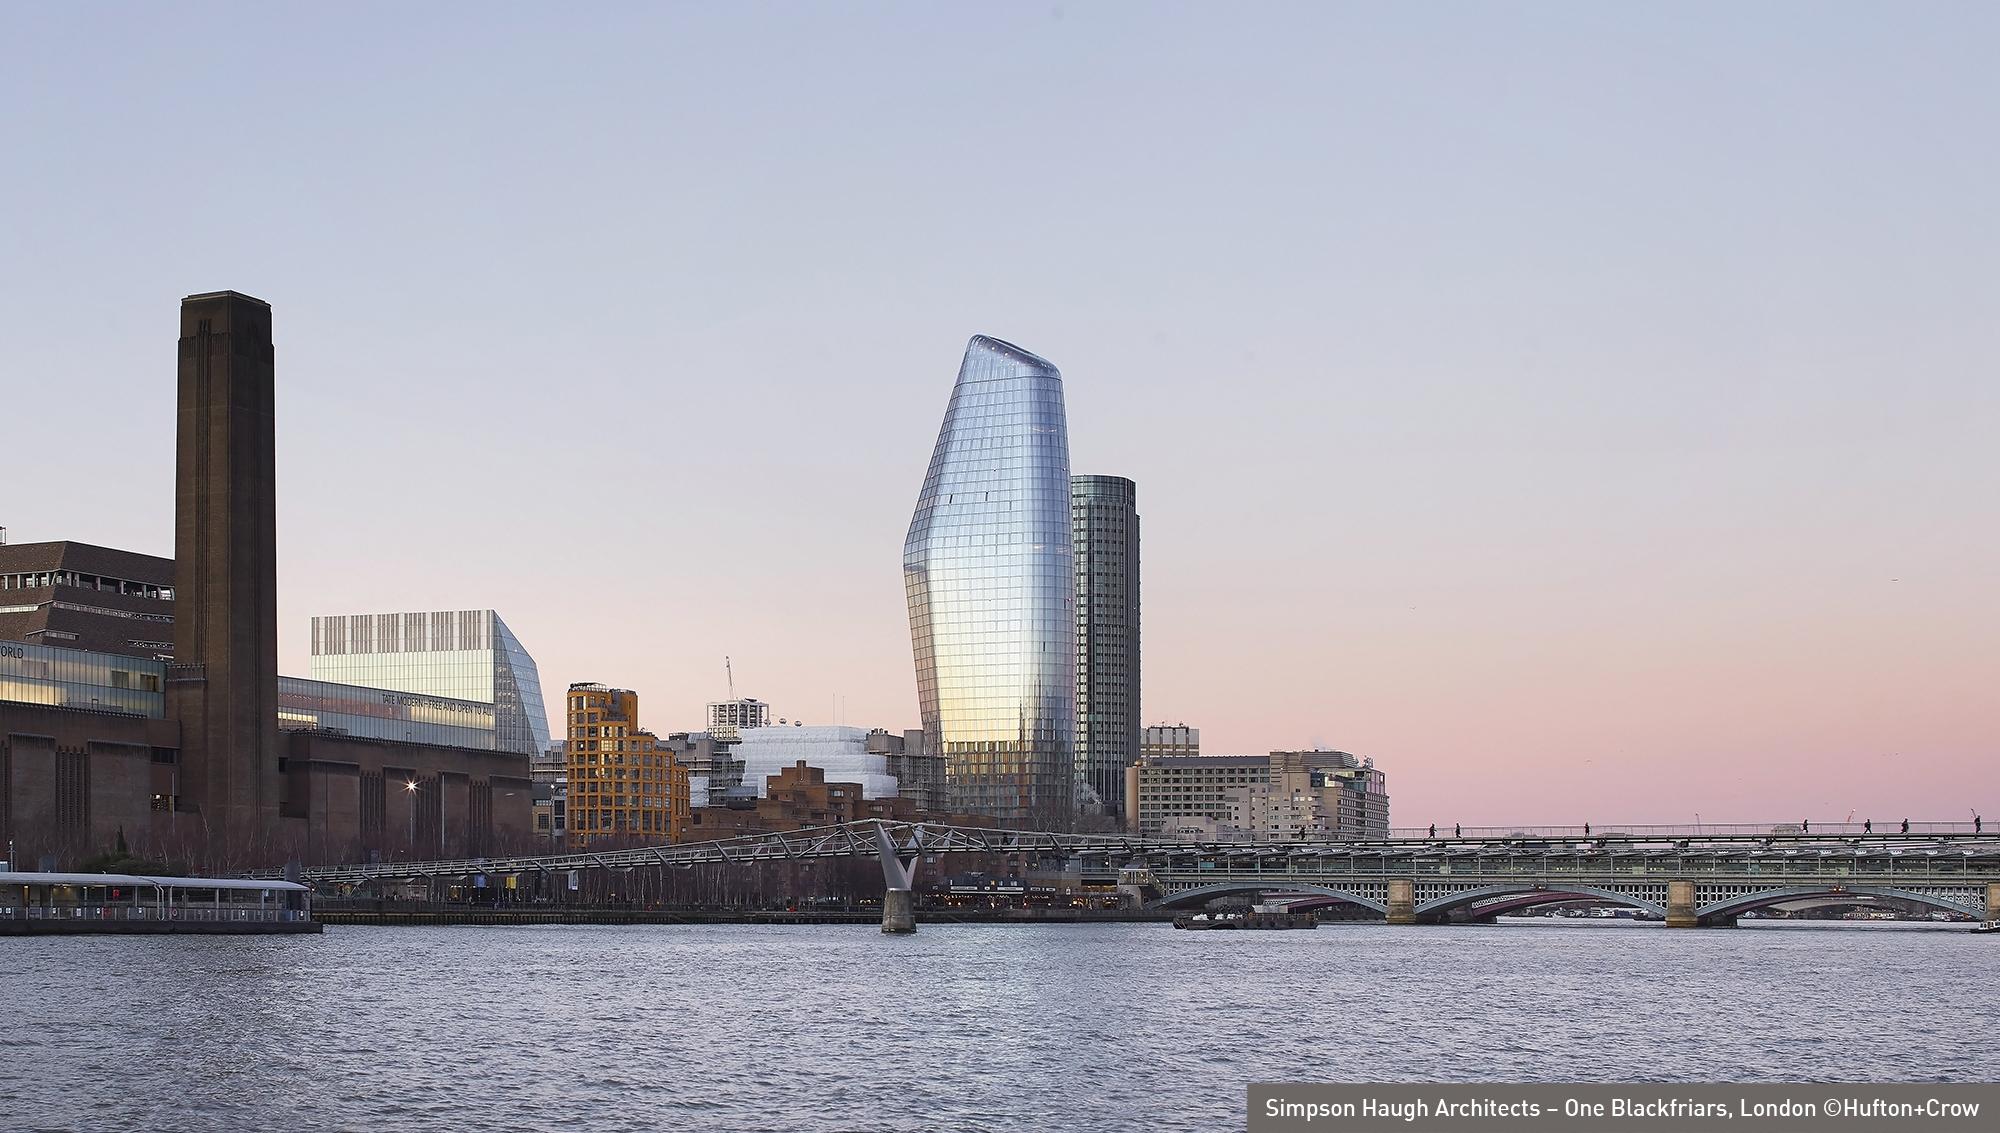 Simpson Haugh Architects_One Blackfriars_London_©Hufton+Crow.jpg